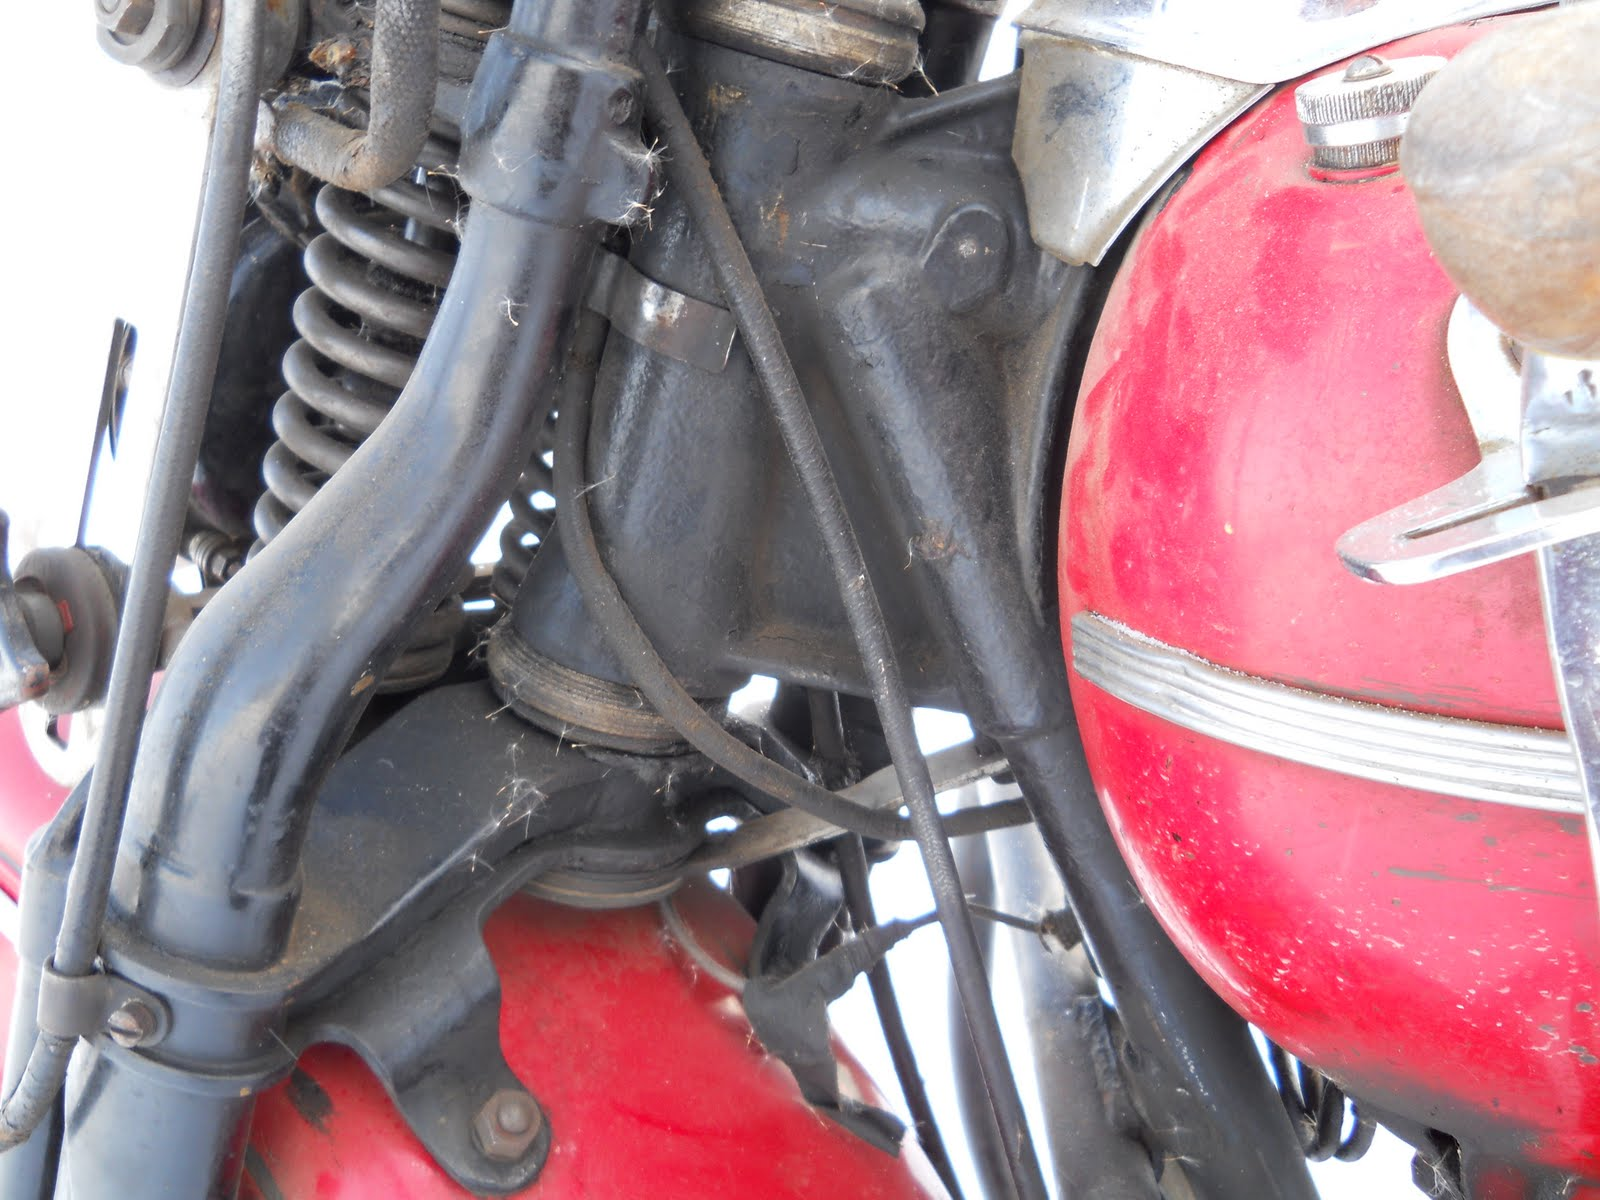 Matt Olsen U0026 39 S Blog  41 Harley Davidson El Wiring Details Part 2